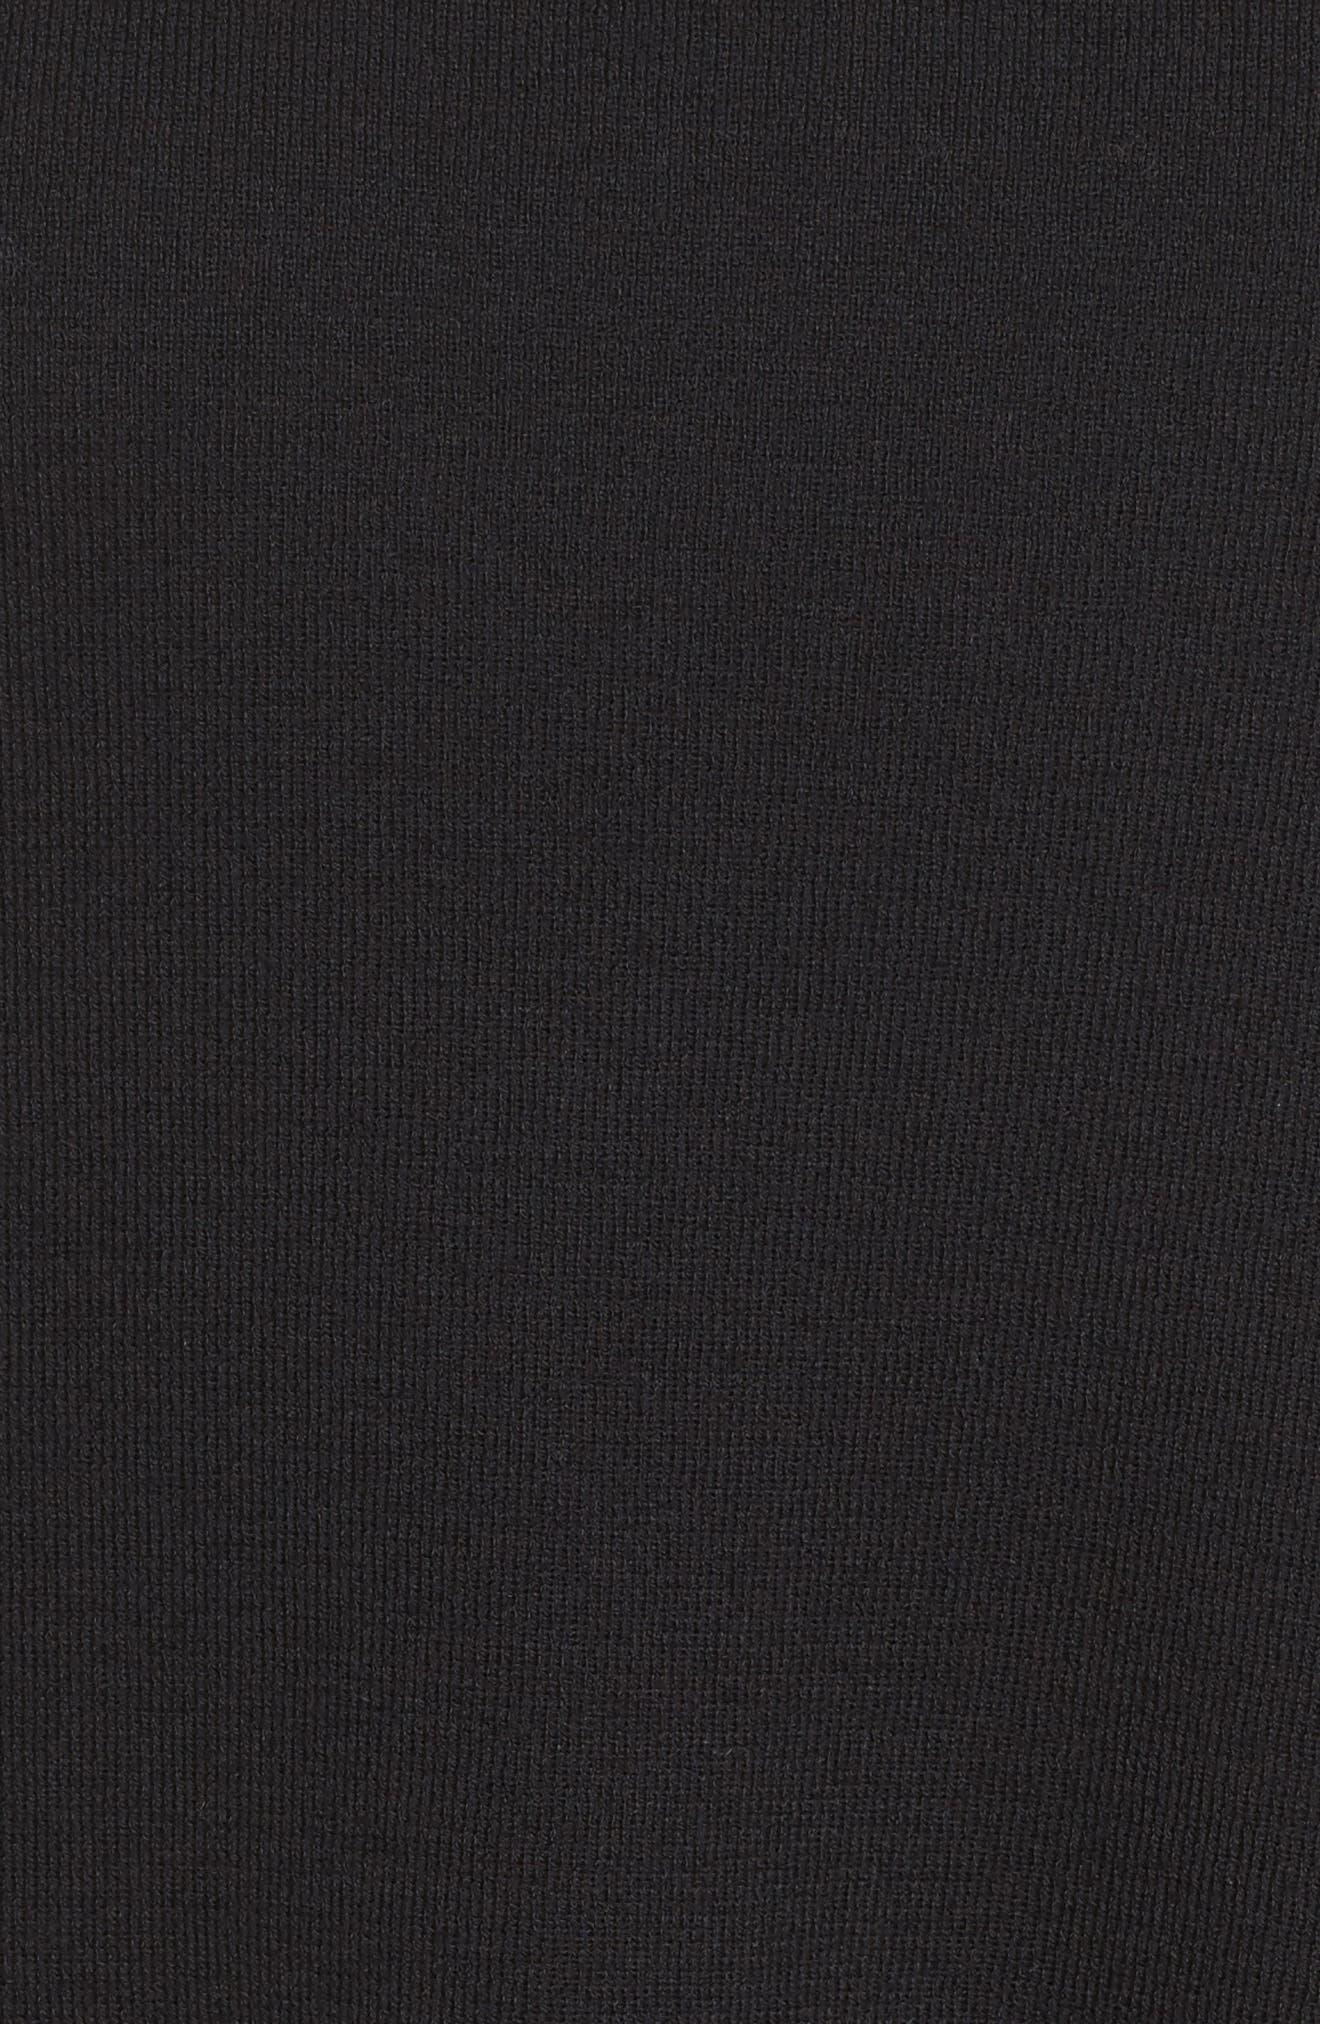 Wool Knit Tunic,                             Alternate thumbnail 5, color,                             Black